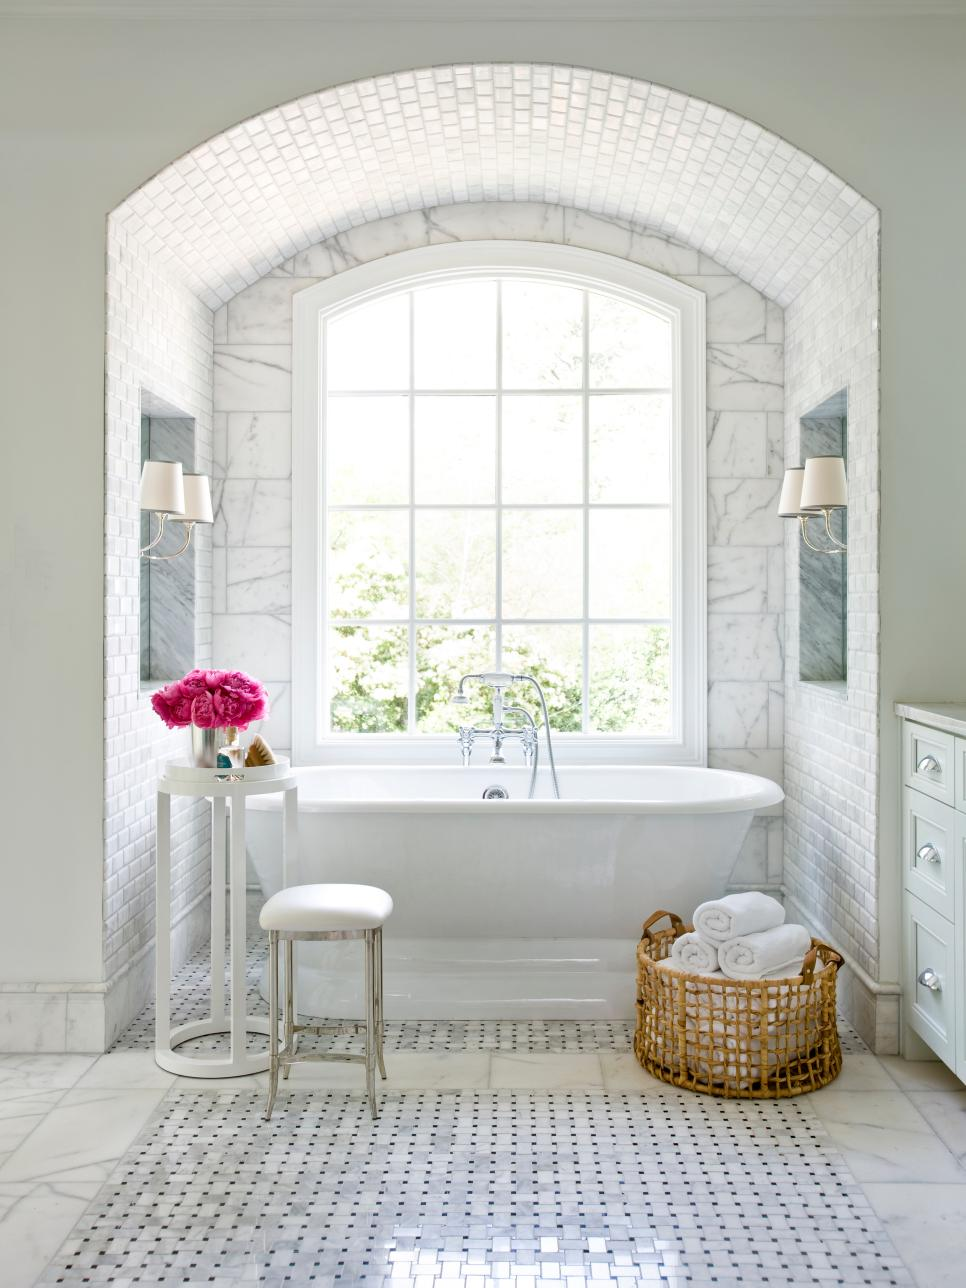 simply chic bathroom tile beauteous wall tiles for bathroom designs  jpeg